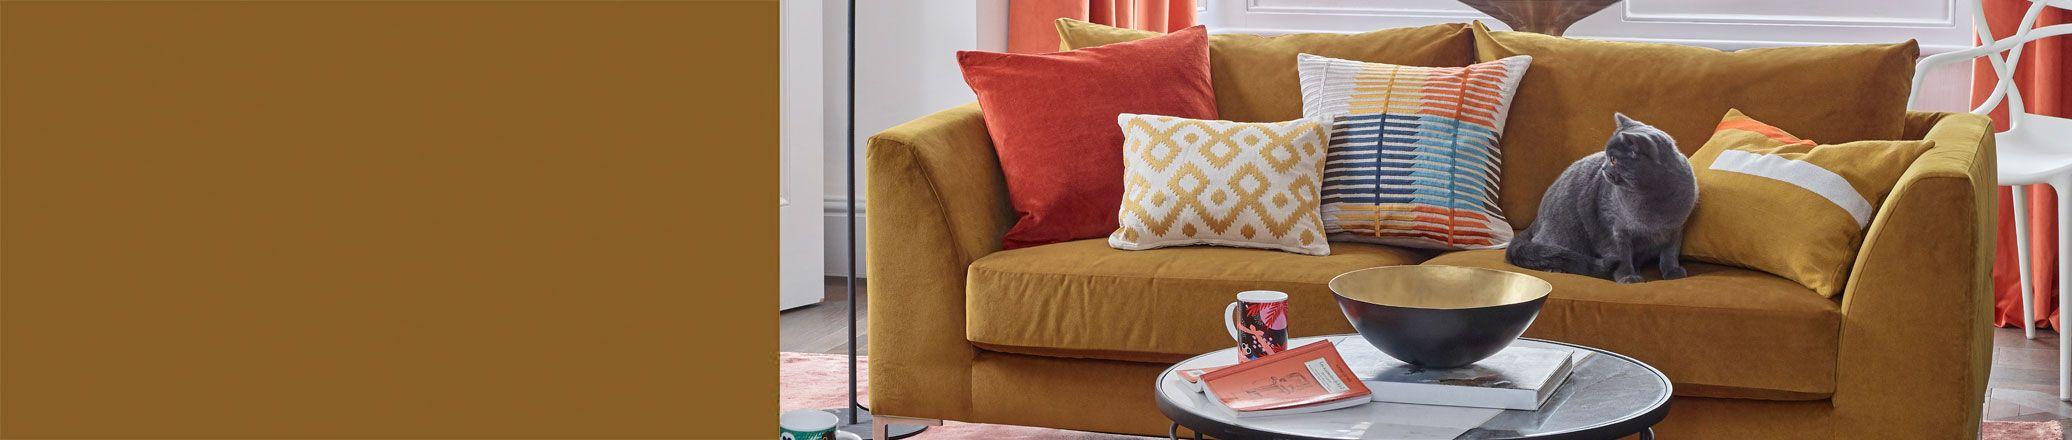 Wondrous Sofas Armchairs Sofas Corner Units Sofa Beds John Pdpeps Interior Chair Design Pdpepsorg